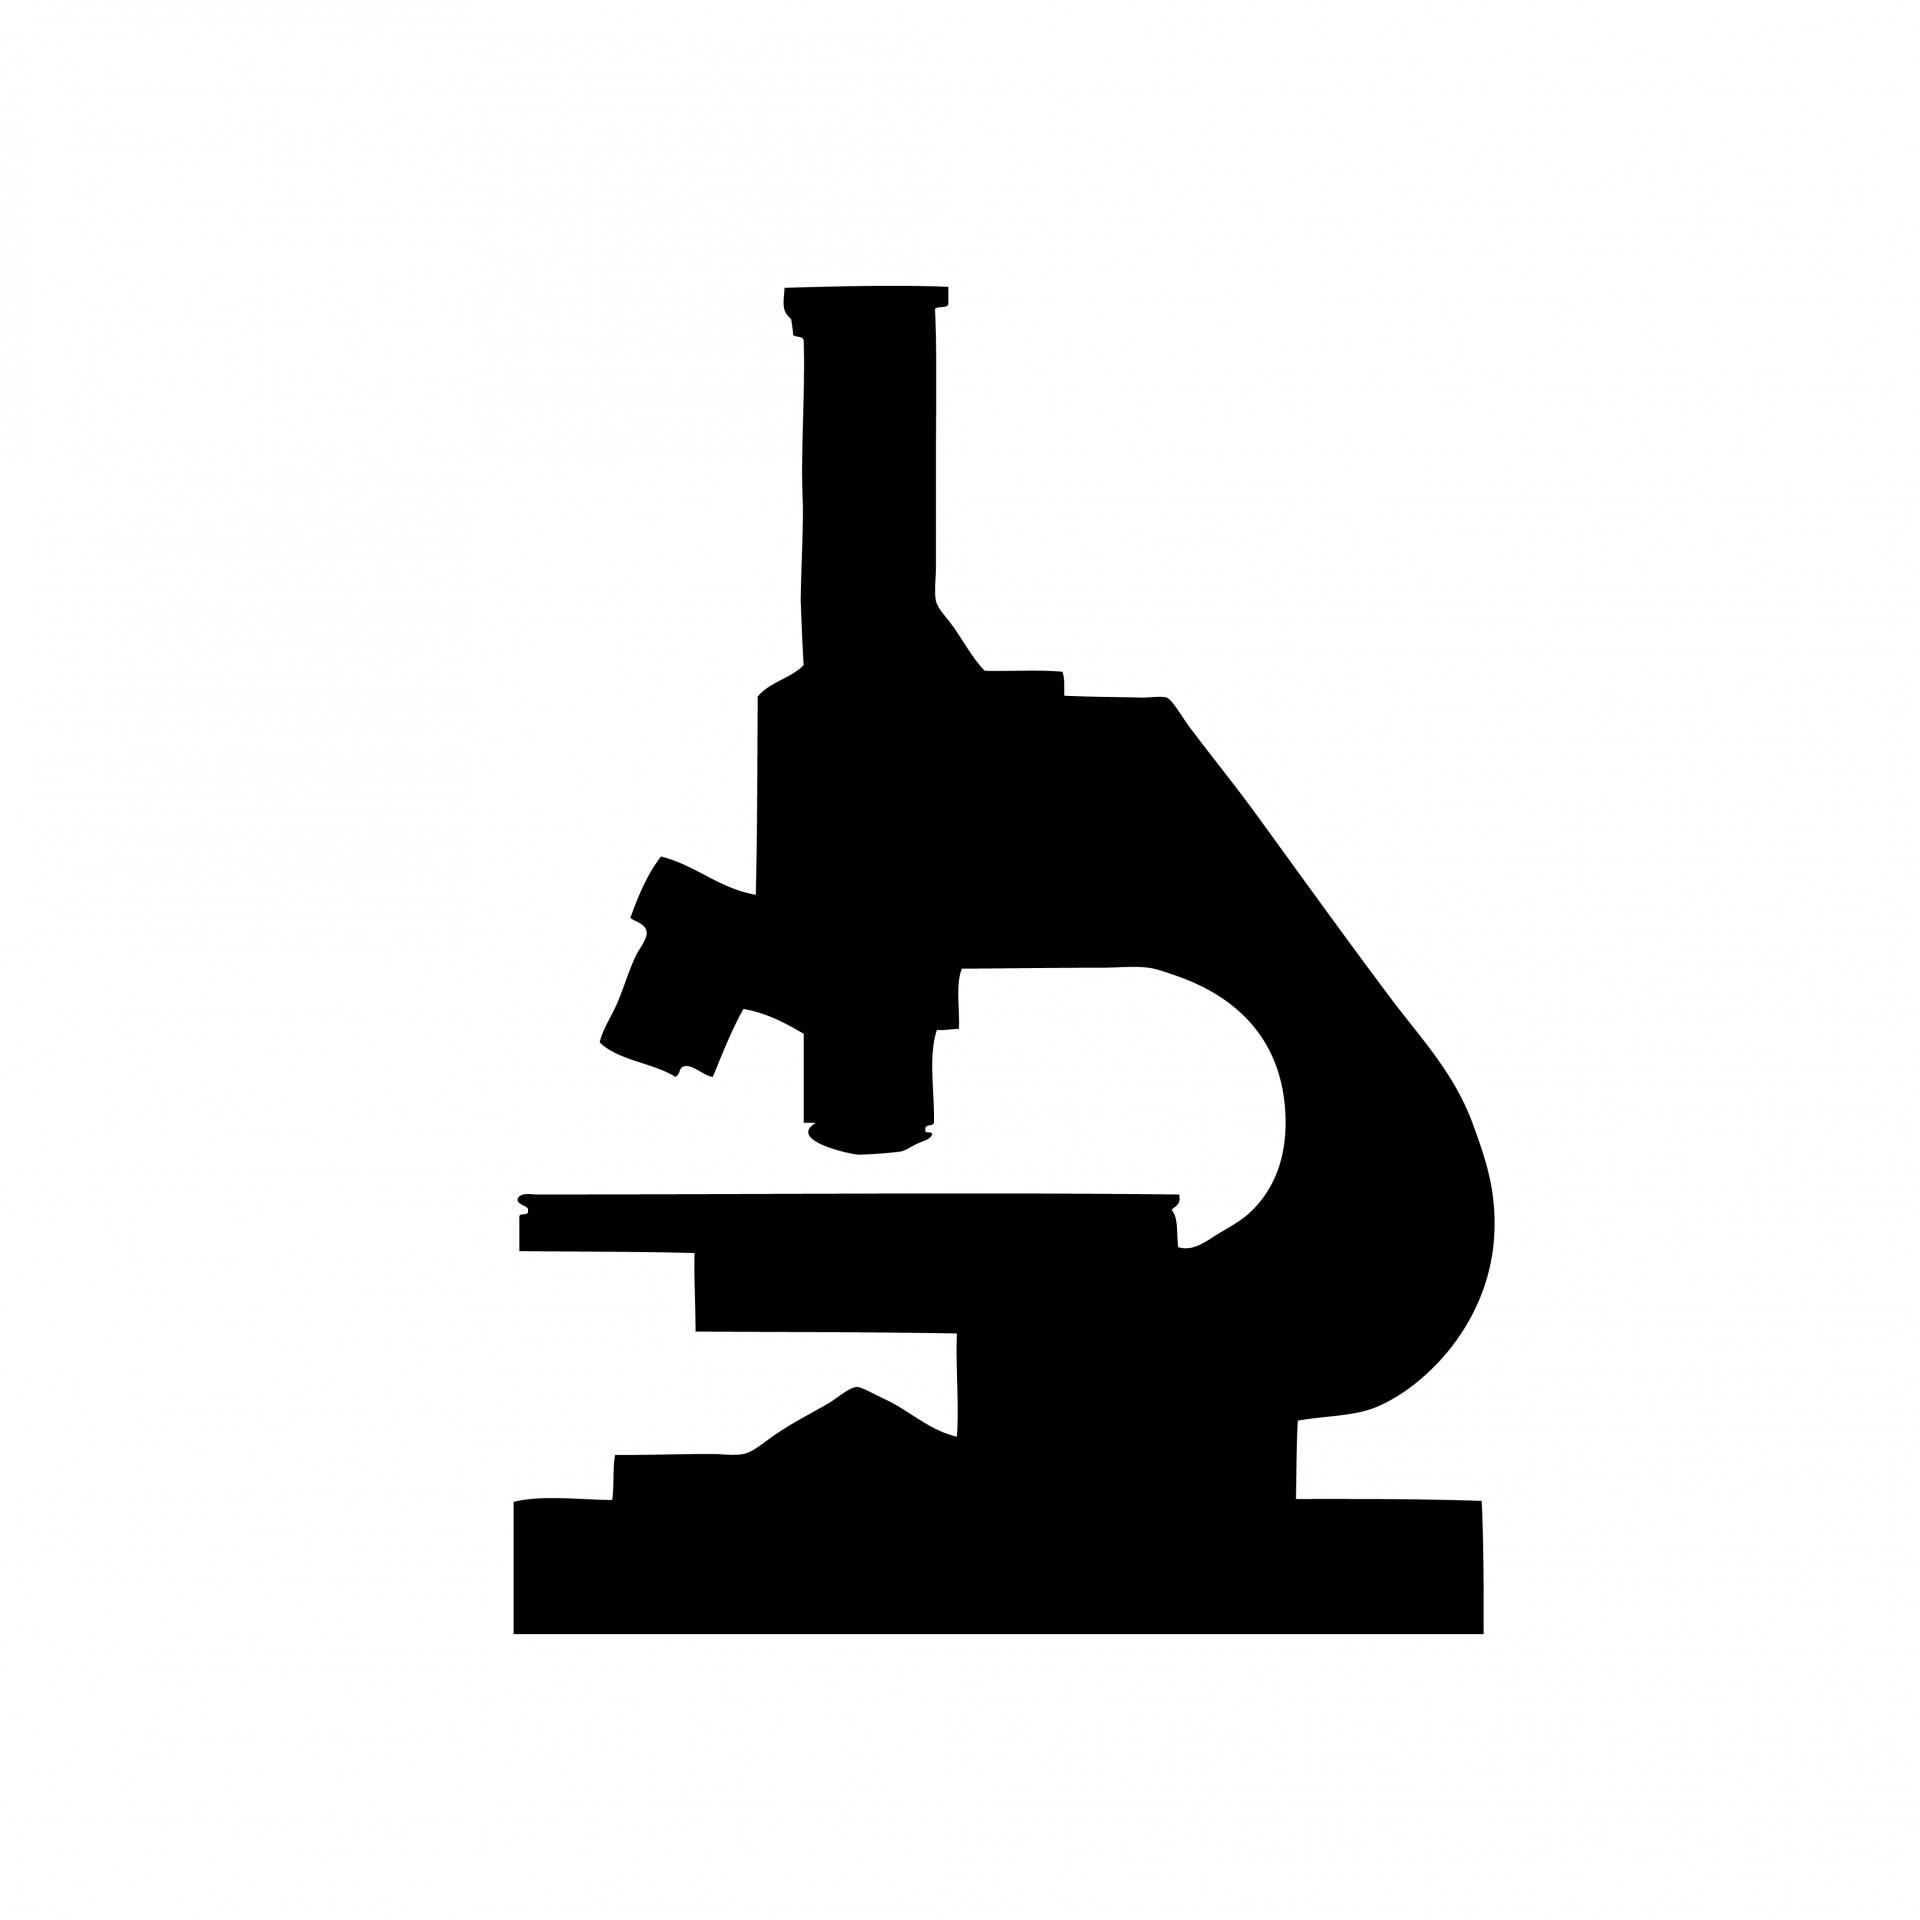 1920x1920 Microscope Silhouette Clipart Free Stock Photo